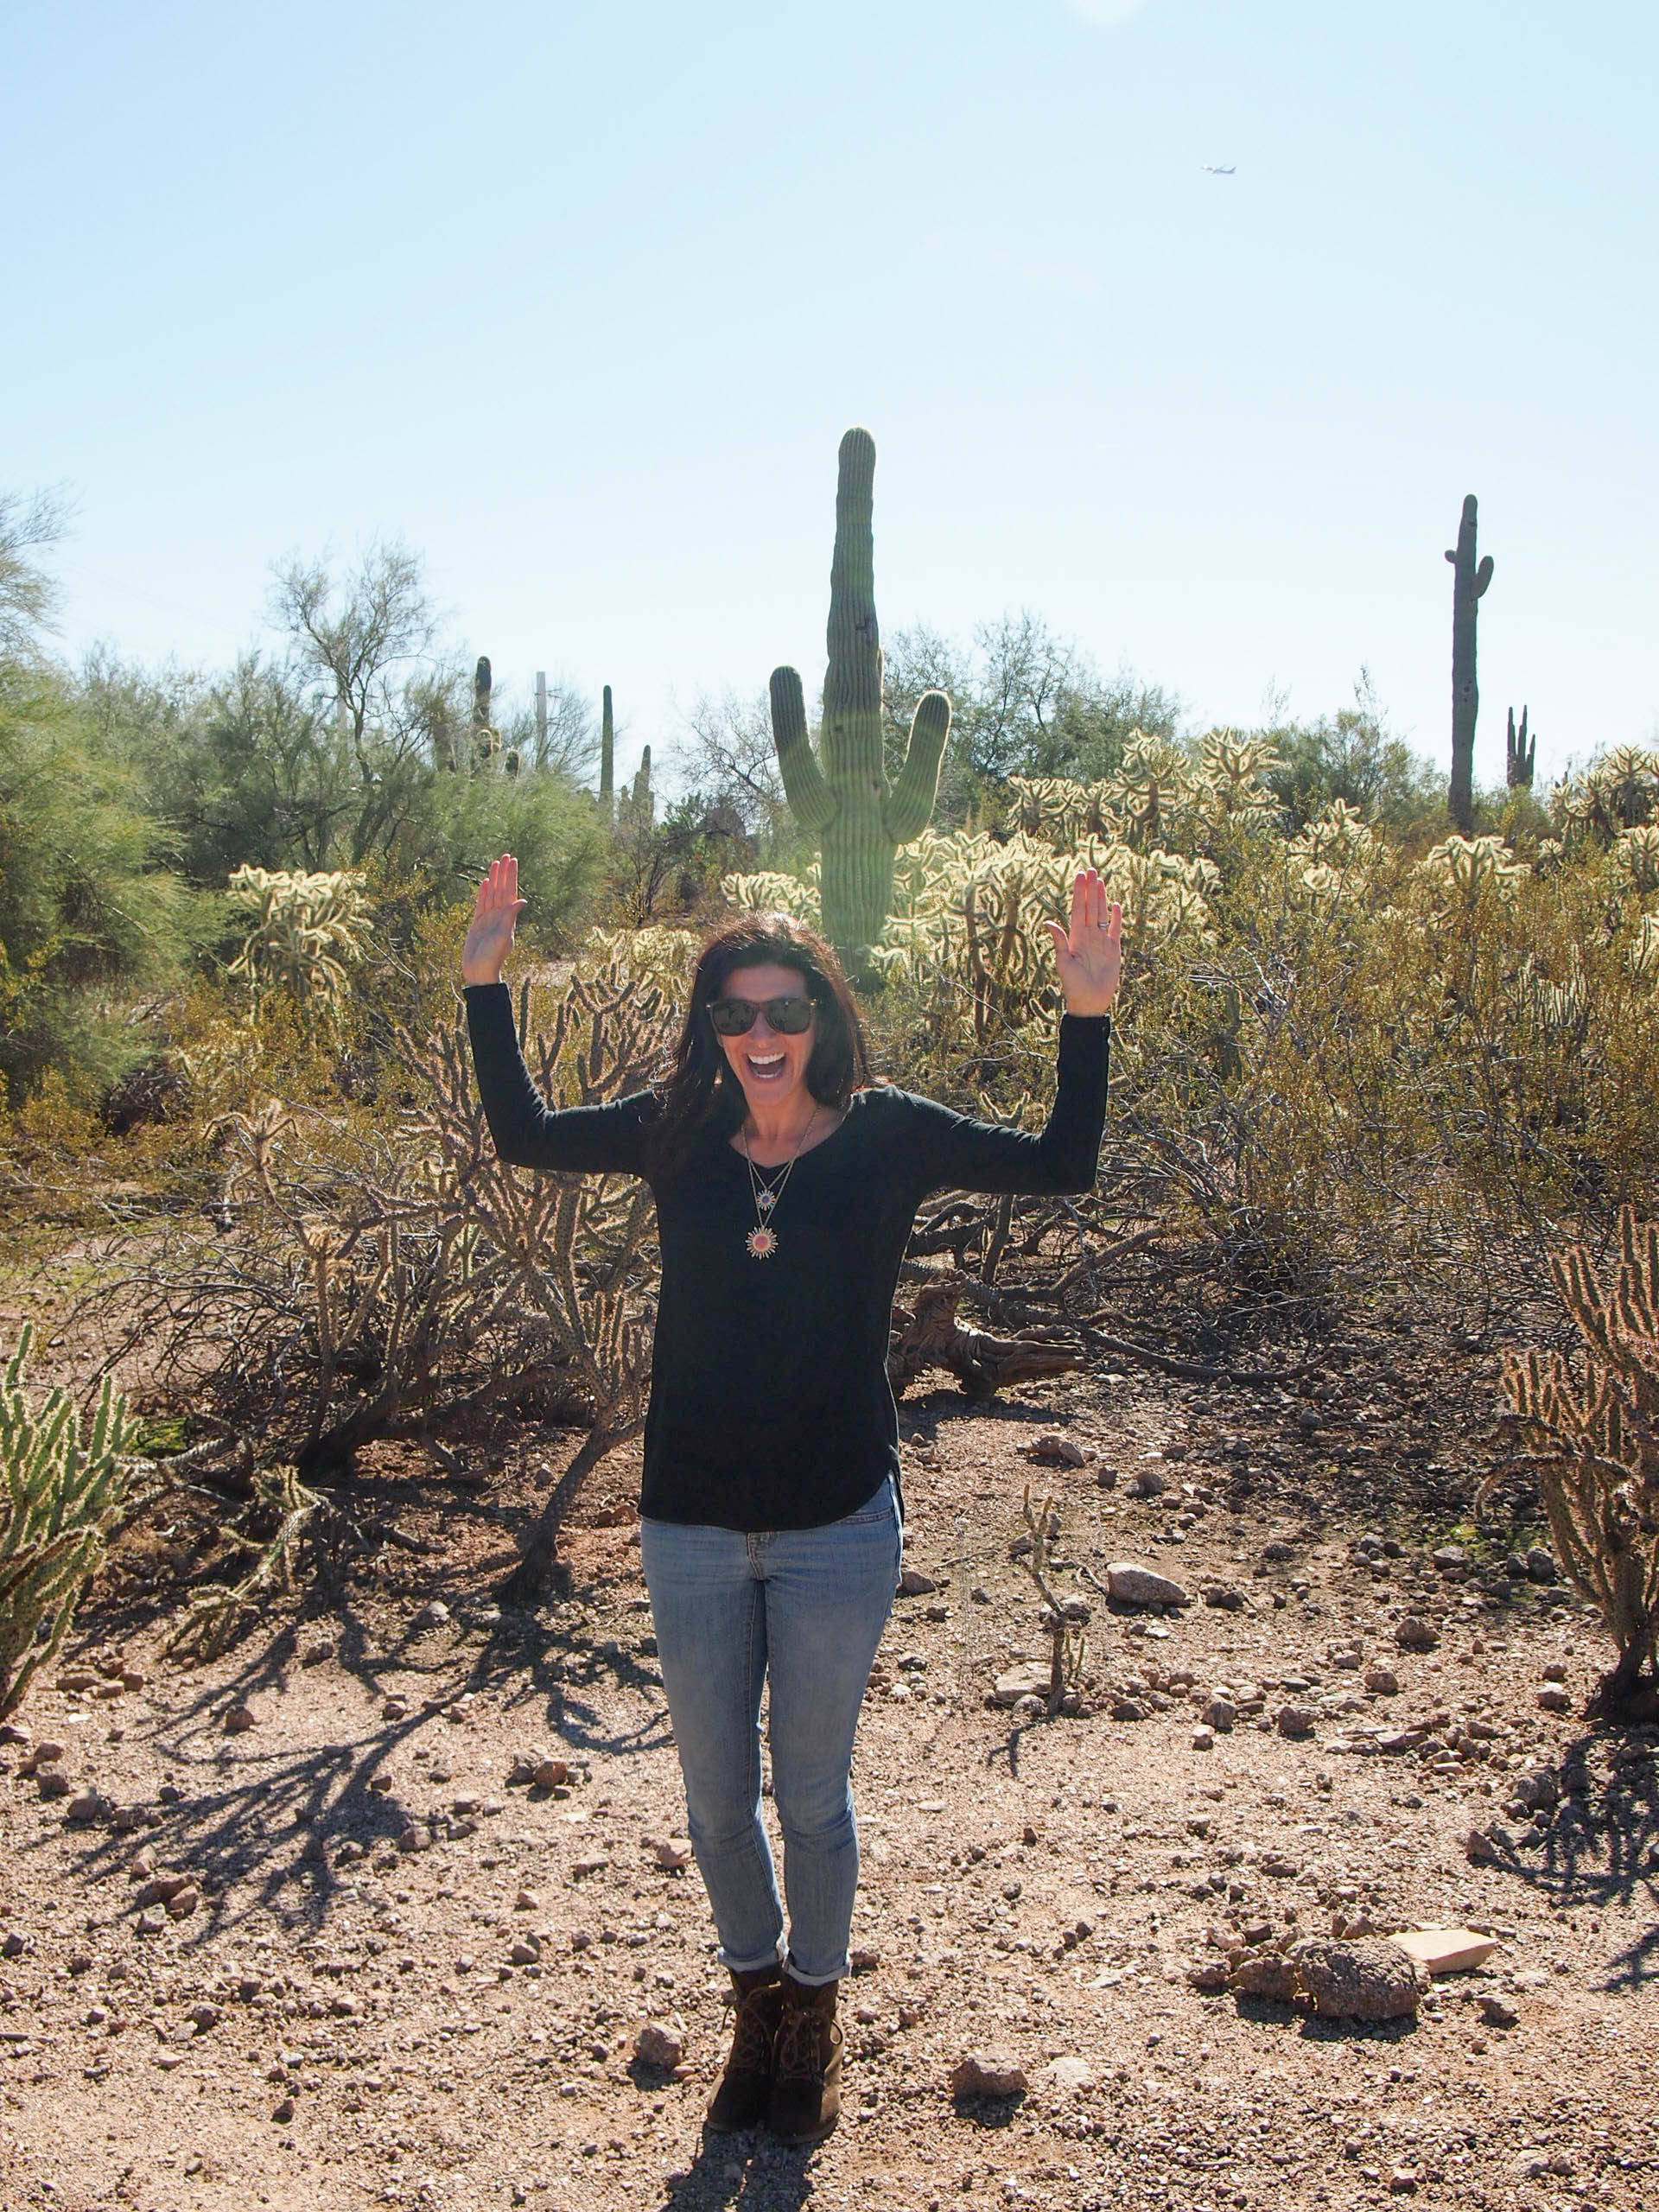 I found the perfect cactus!